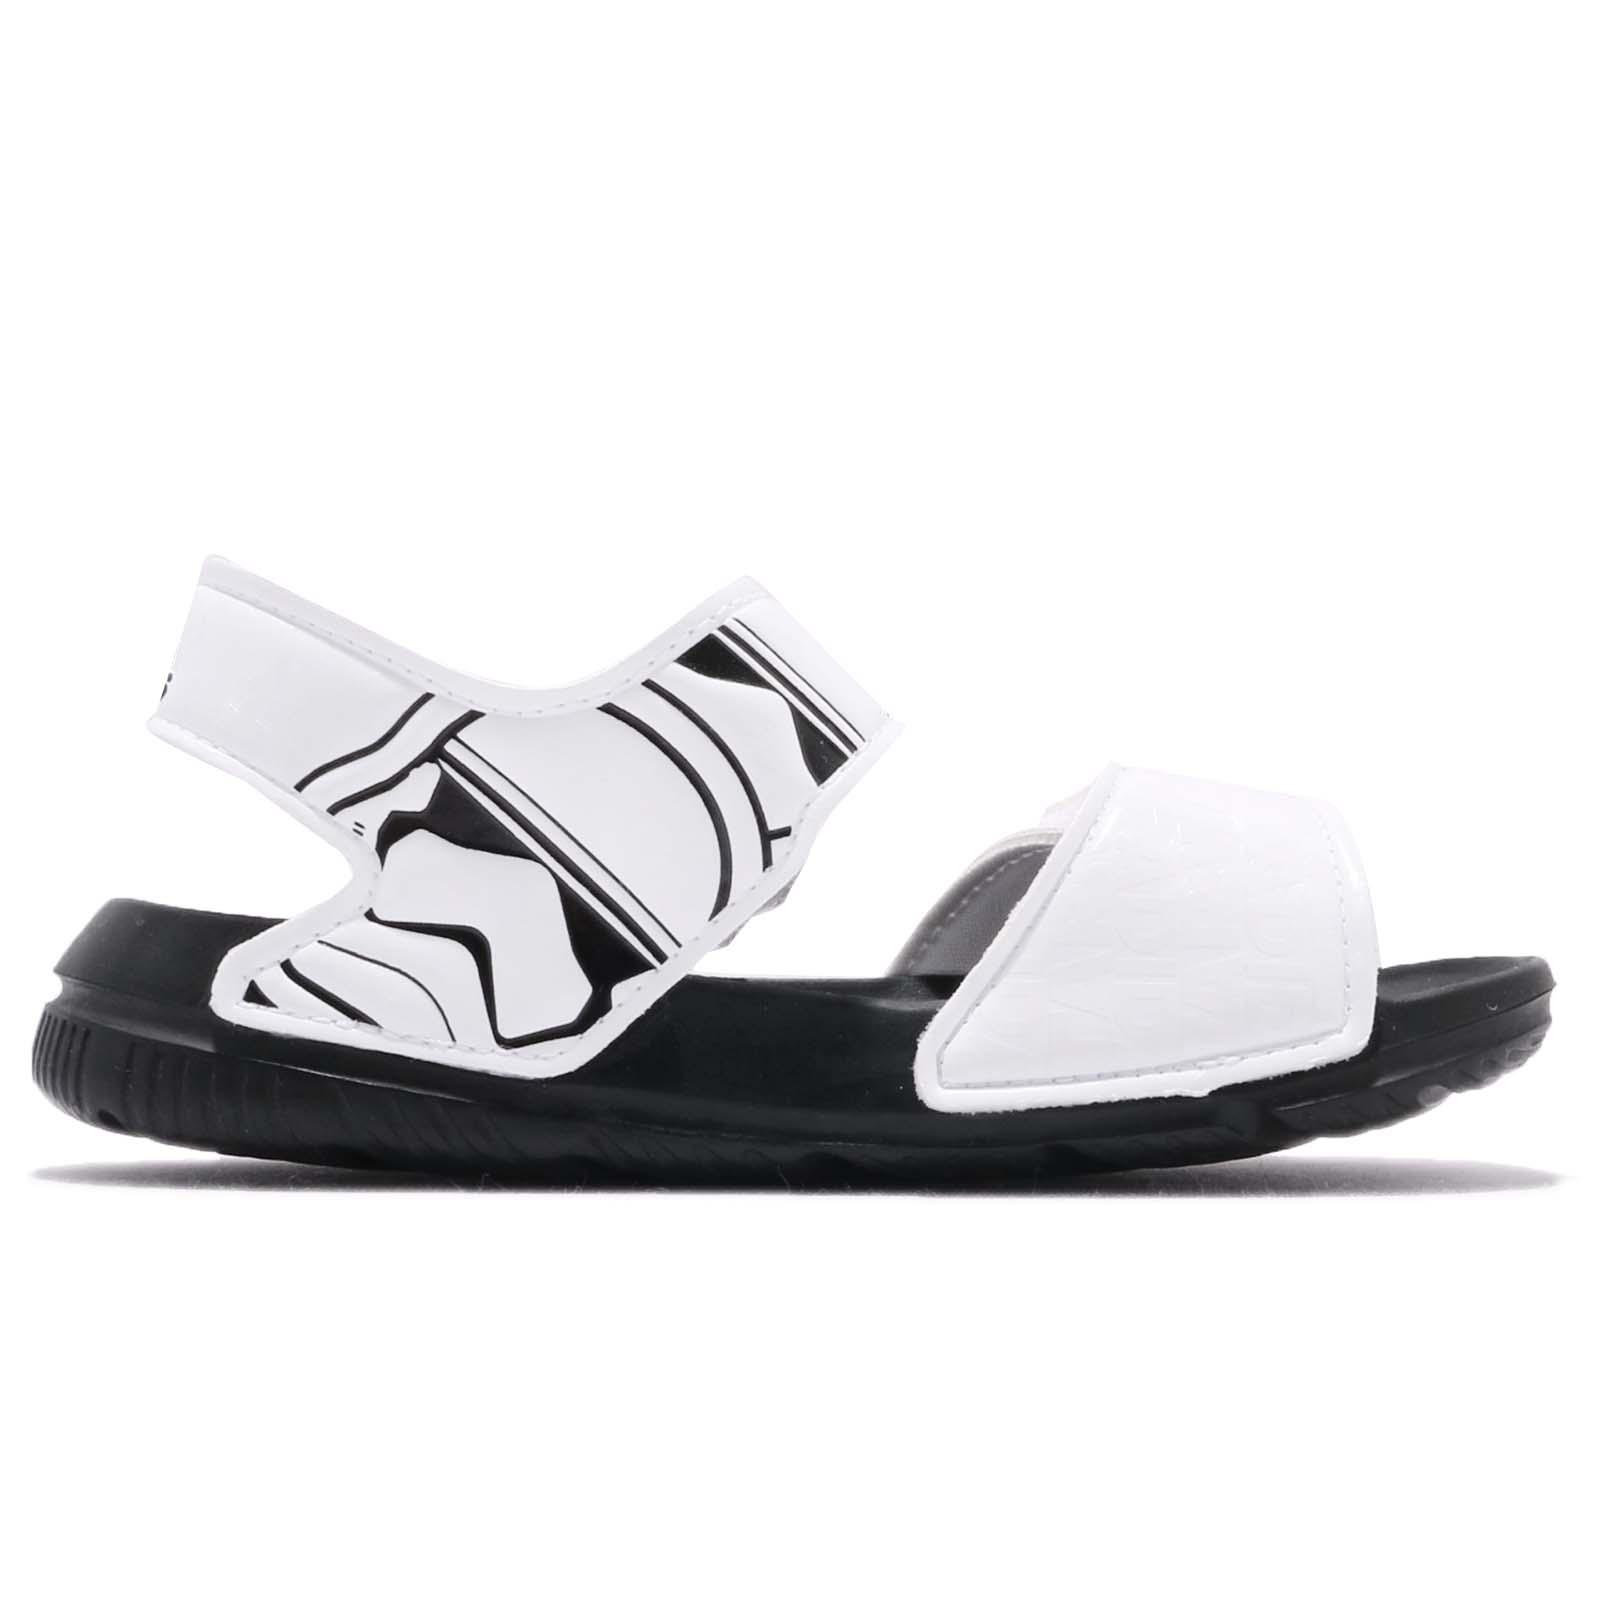 adidas Star Wars AltaSwim I Stormtrooper White Infant Toddler Baby Sandal CQ0128